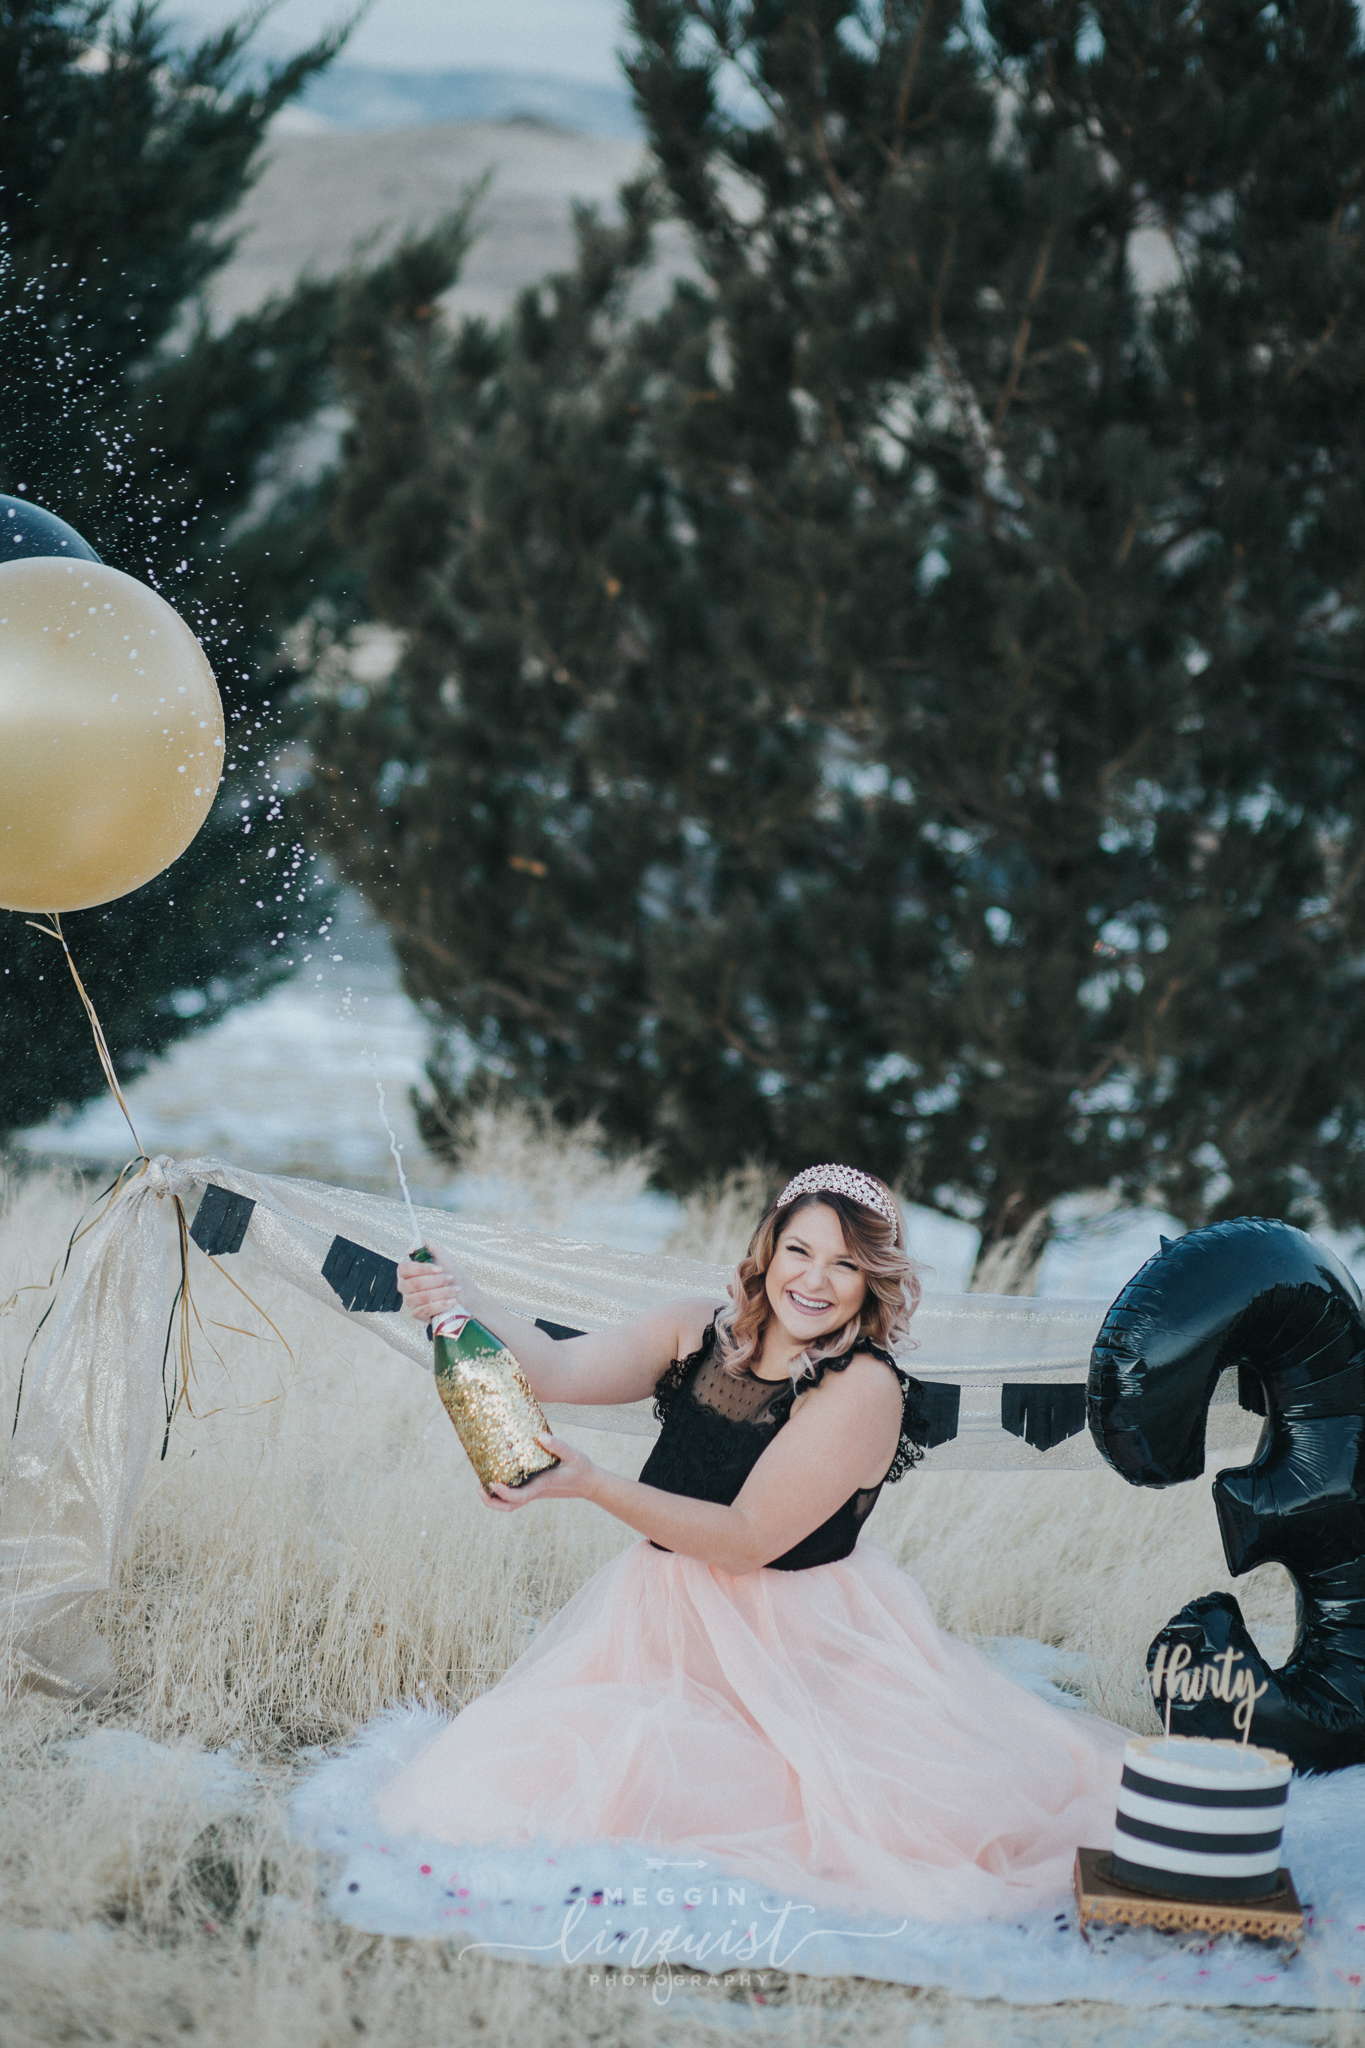 30th-birthday-cake-smash-reno-lake-tahoe-photographer-9.jpg